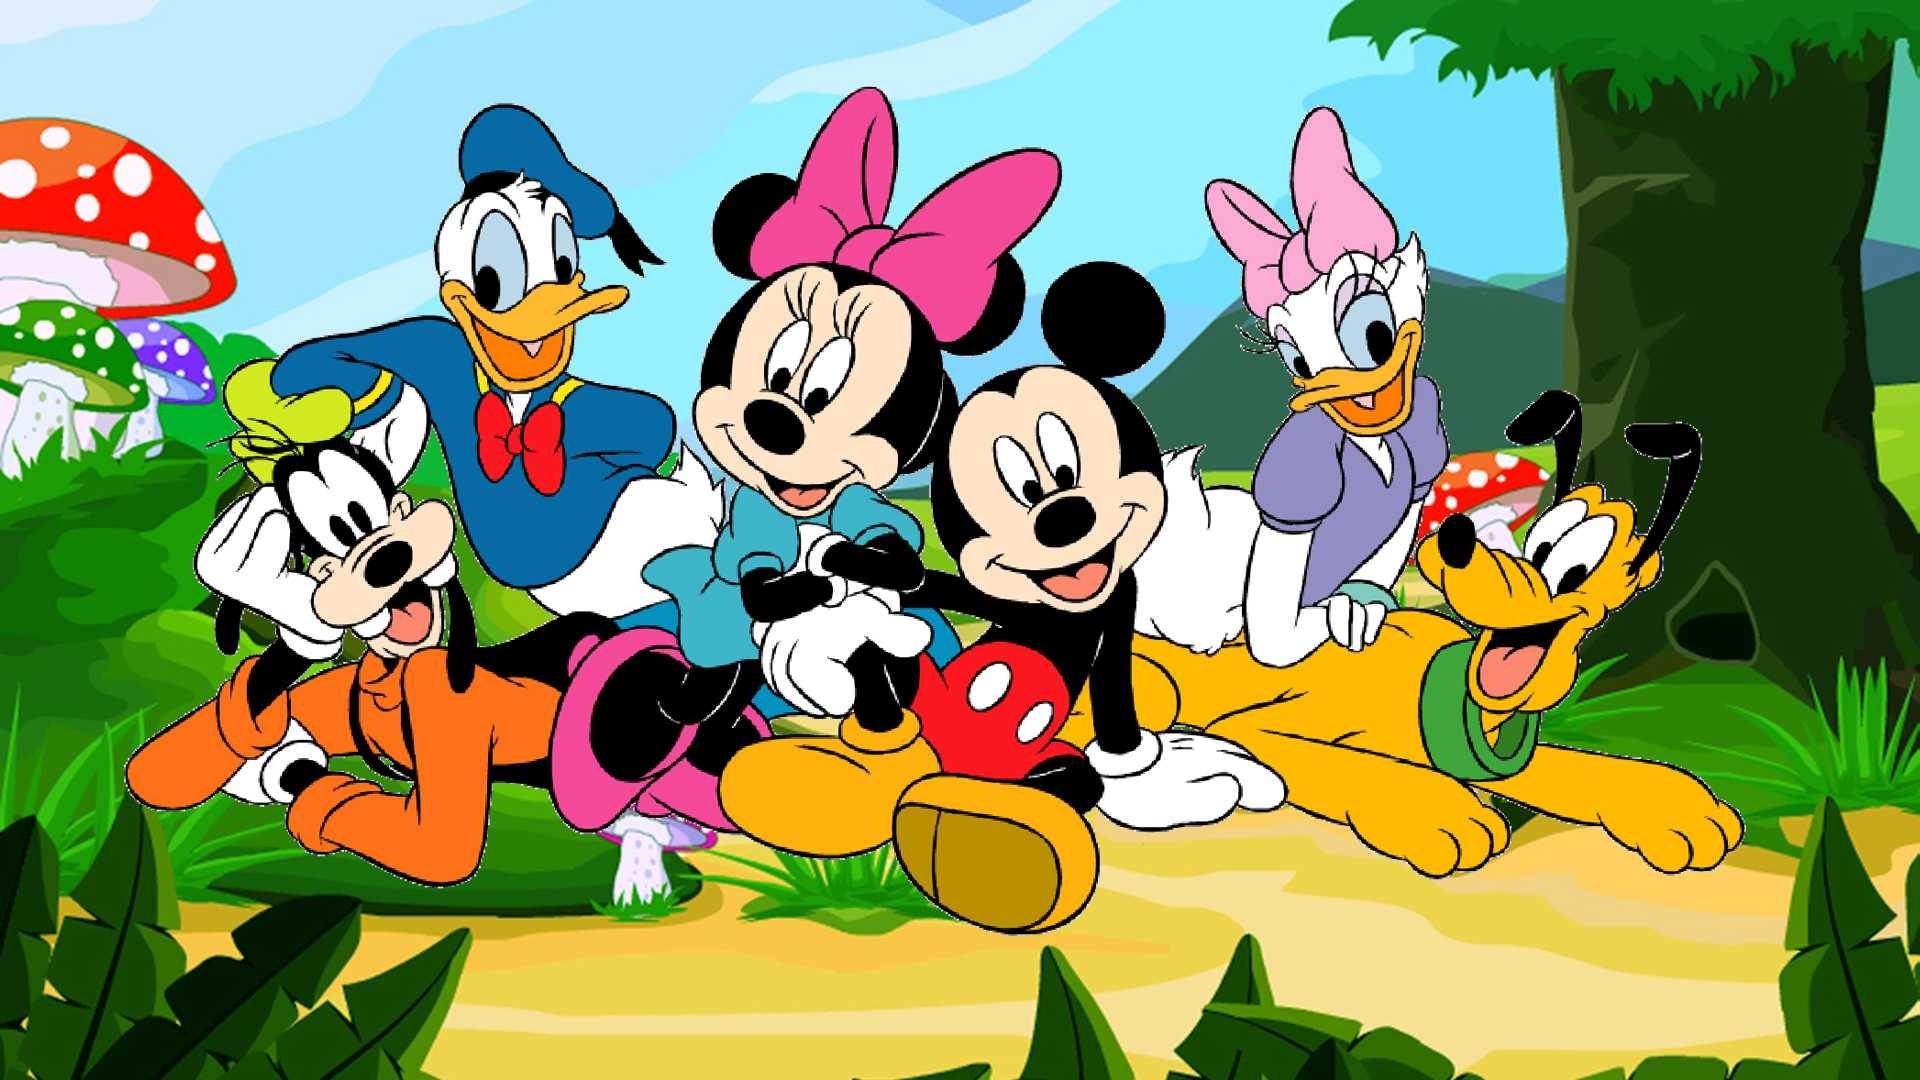 Cartoon Wallpaper Free Download New Beautiful Disney Cartoon Wallpapers Hd Free Download 13995 Hd Wallpaper Backgrounds Download